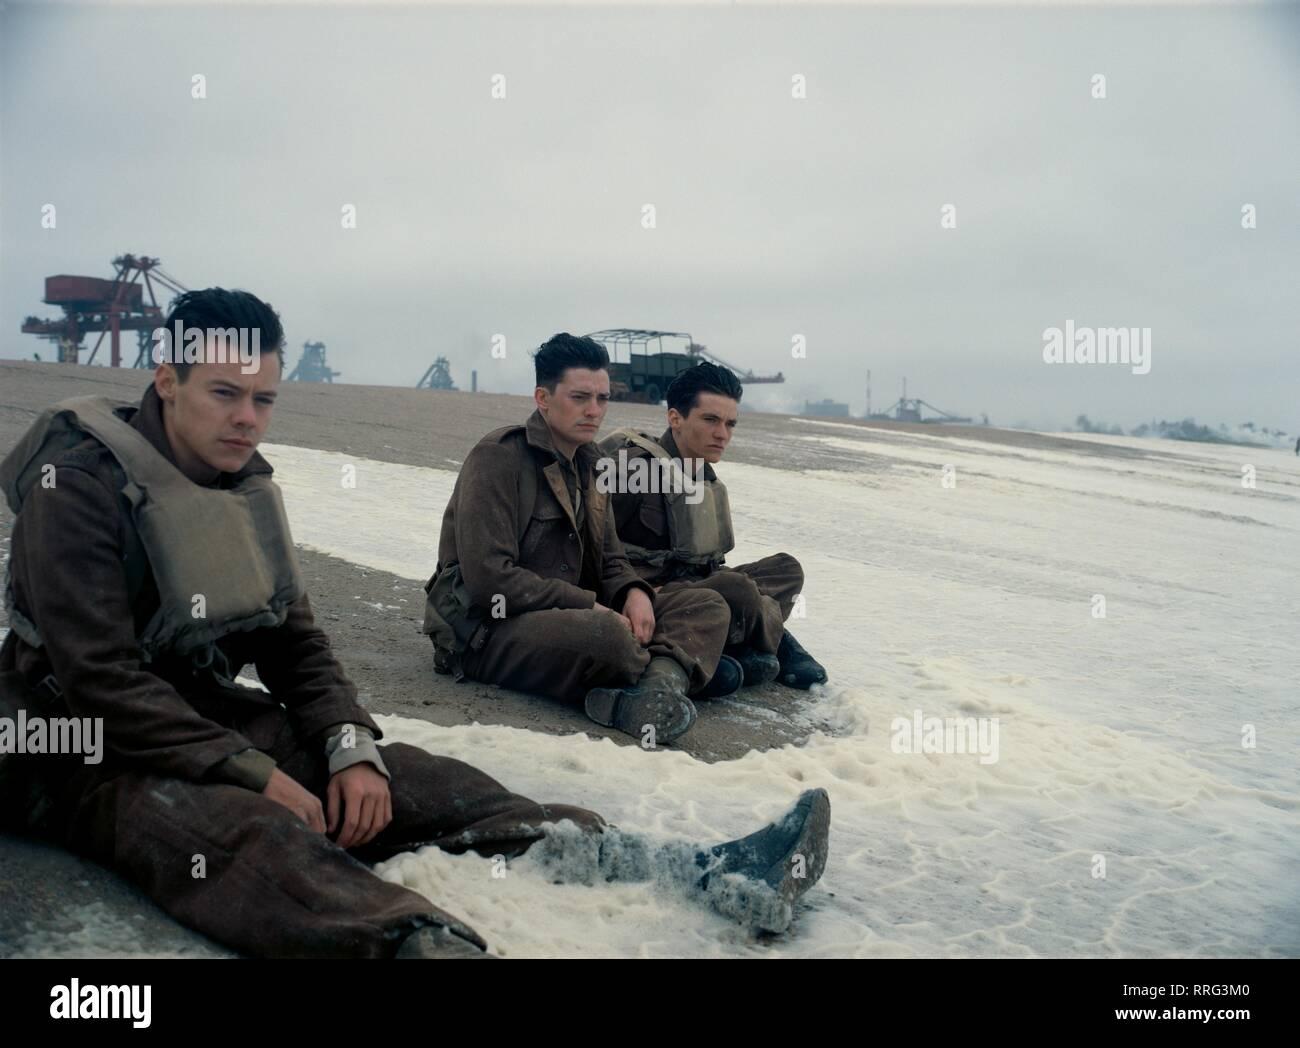 DUNKIRK, HARRY STYLES, ANEURIN BARNARD , FIONN WHITEHEAD, 2017 - Stock Image